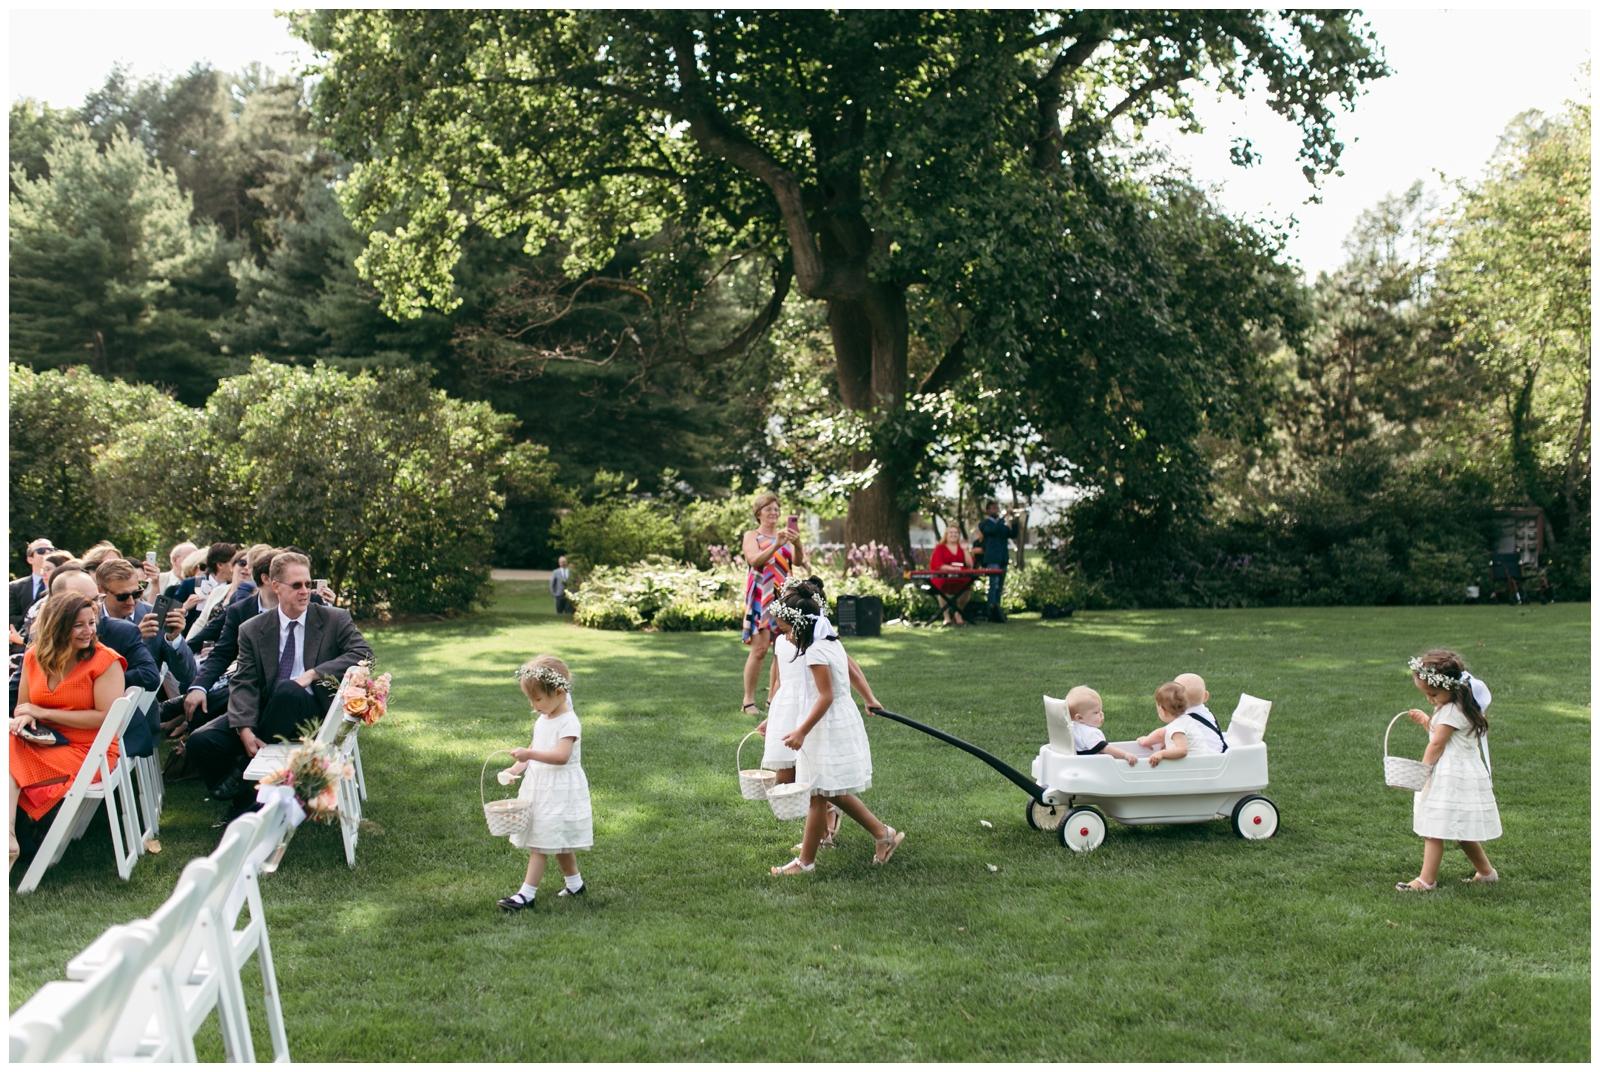 Moraine-Farm-wedding-Bailey-Q-Photo-Massachusetts-wedding-photpgrapher-056.jpg